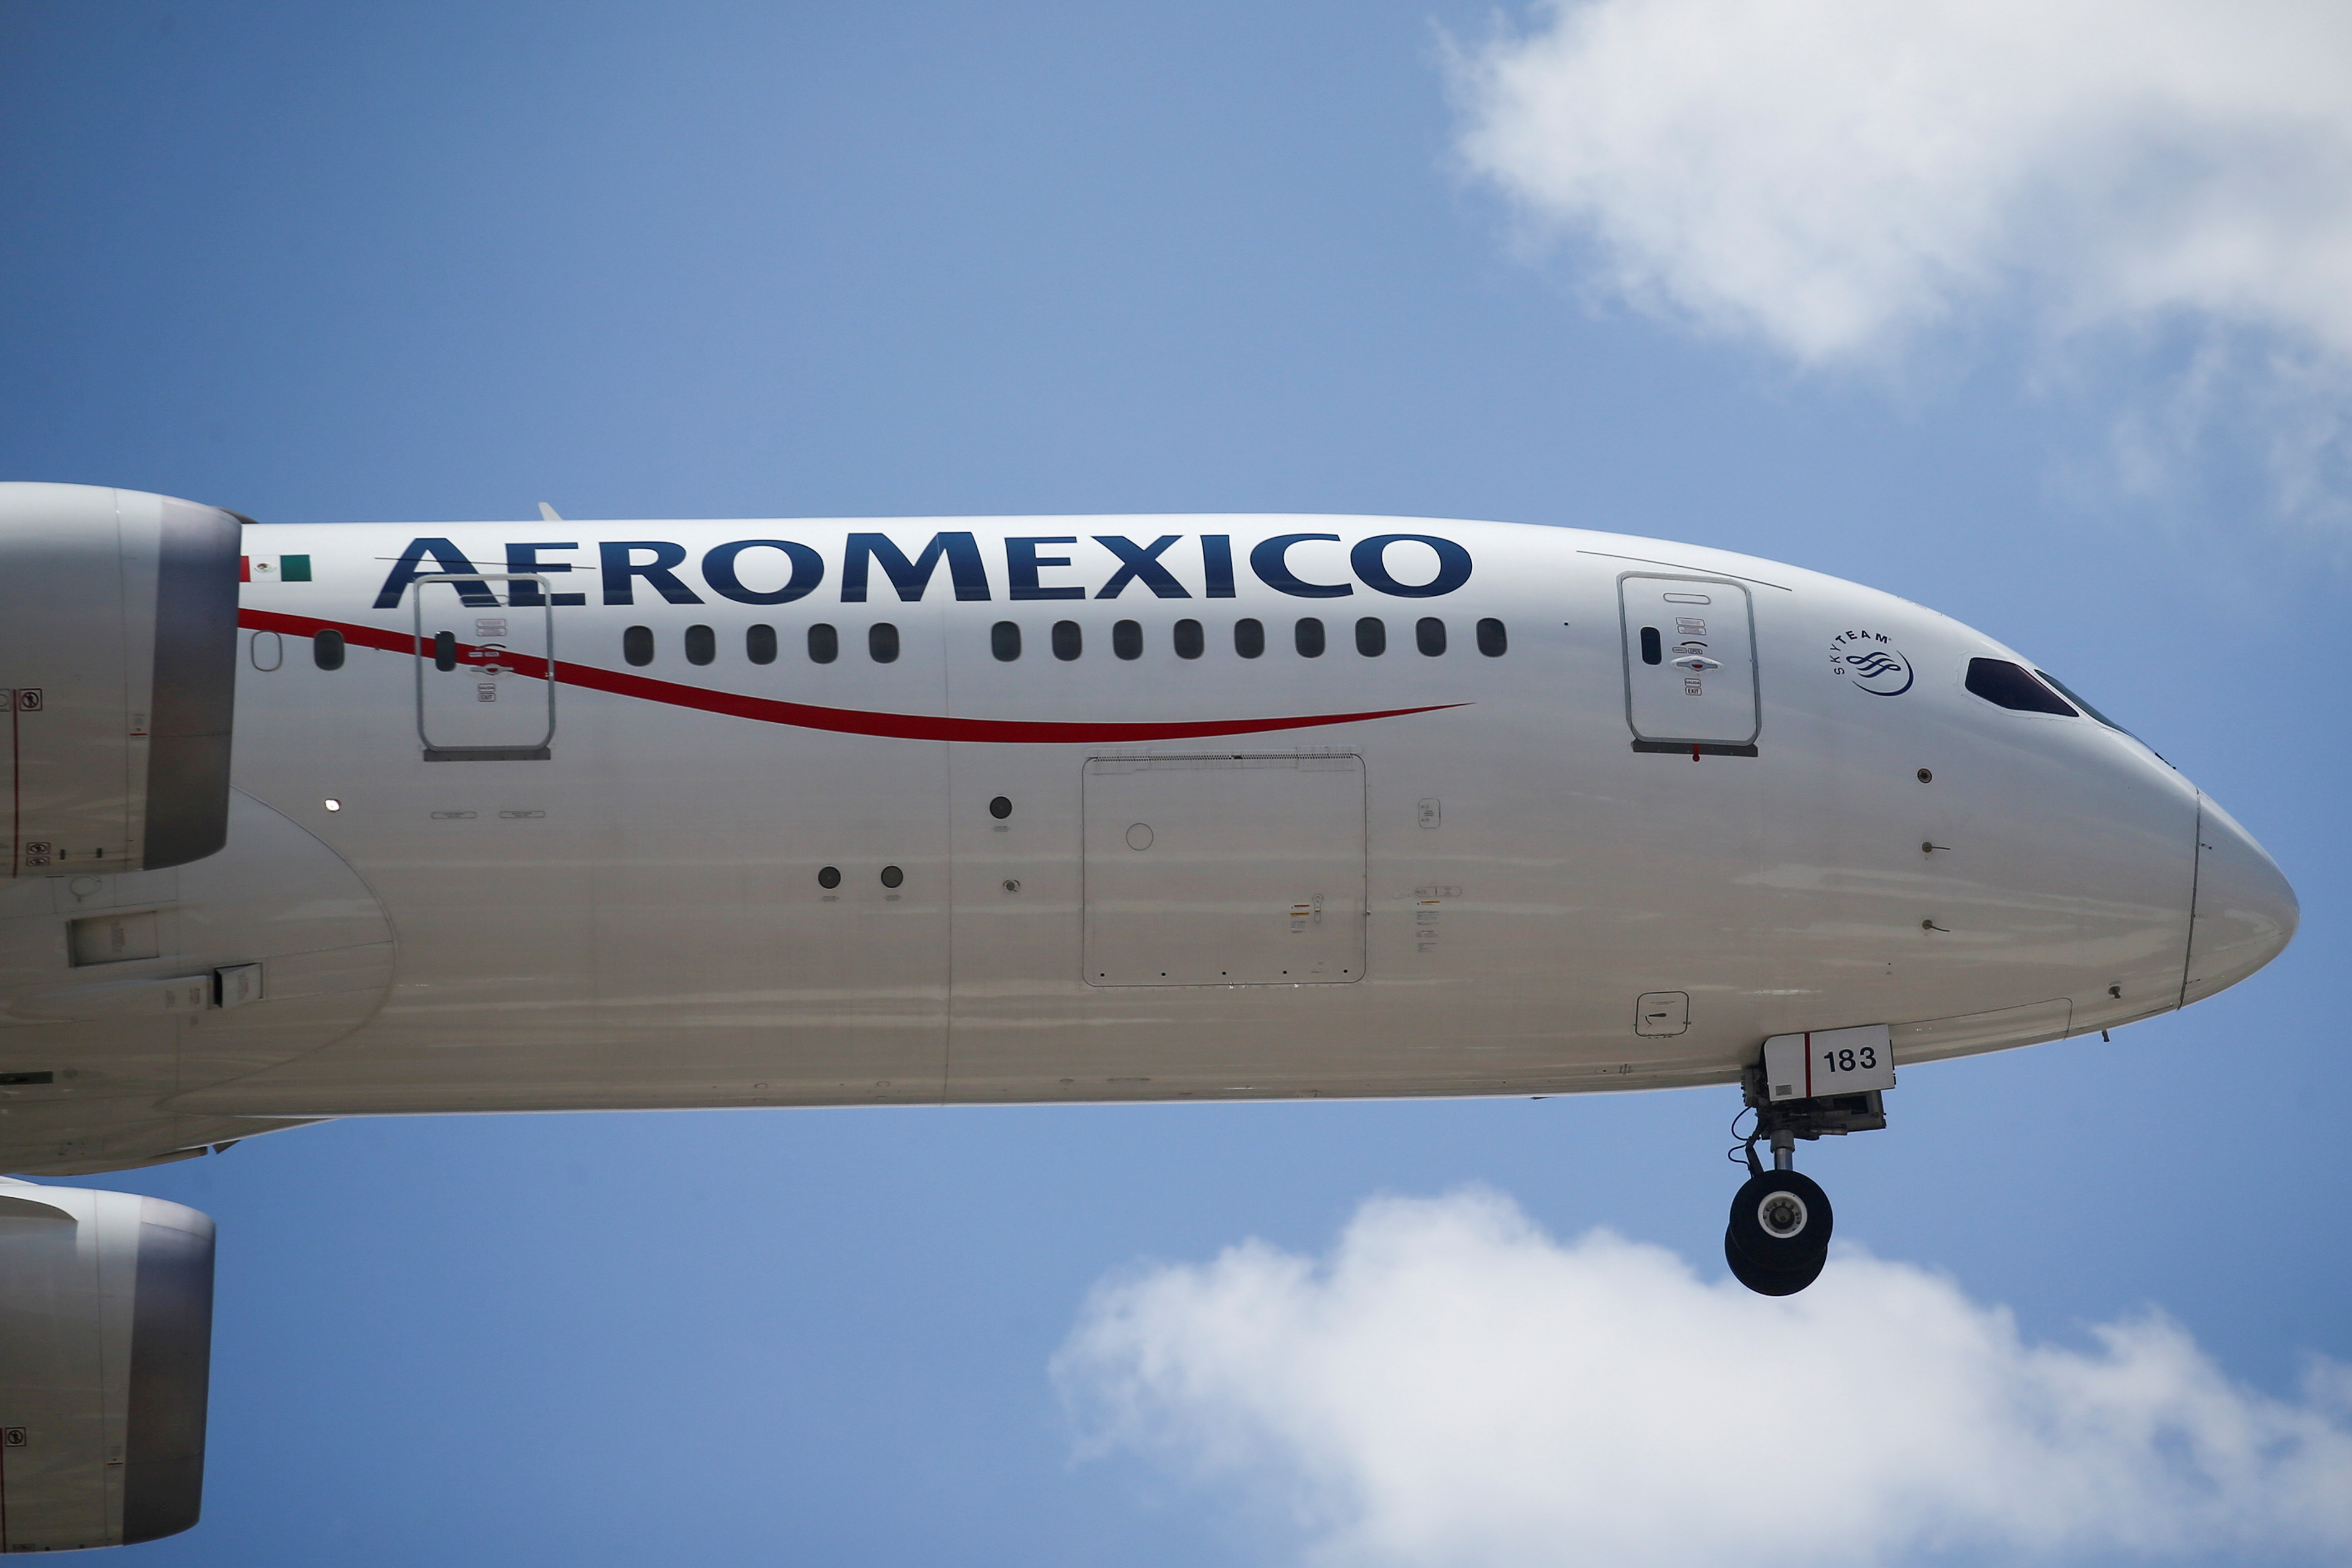 An Aeromexico airplane prepares to land on the airstrip at Benito Juarez international airport in Mexico City, Mexico, July 1, 2020. REUTERS/Edgard Garrido/File Photo